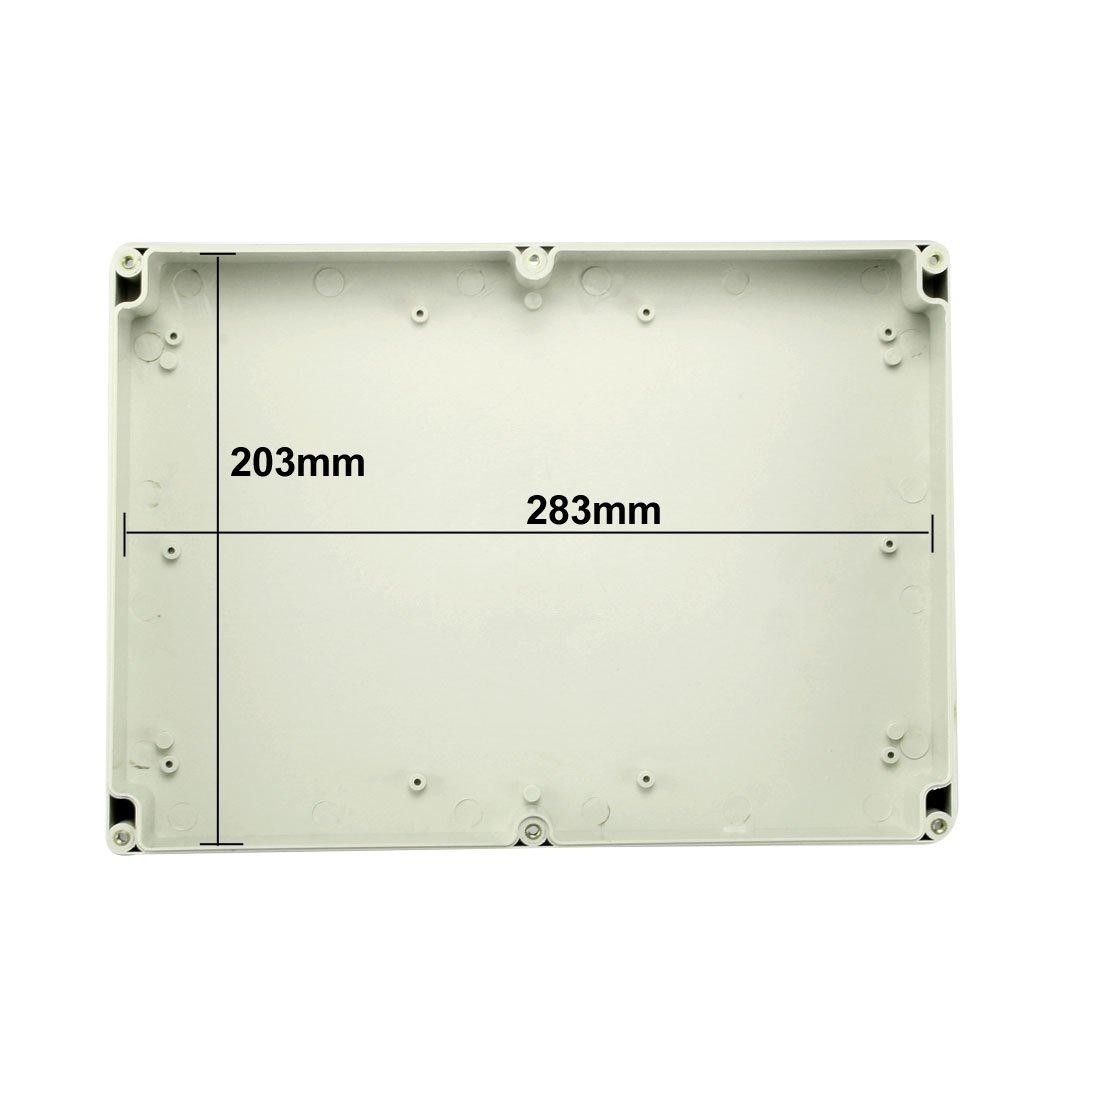 Kapsto GPN 900 A 14.5 Polyethylene Closure 14.5 mm Tube ID 11.5 mm Tube OD Pack of 100 Poppelmann 90001450000 Natural